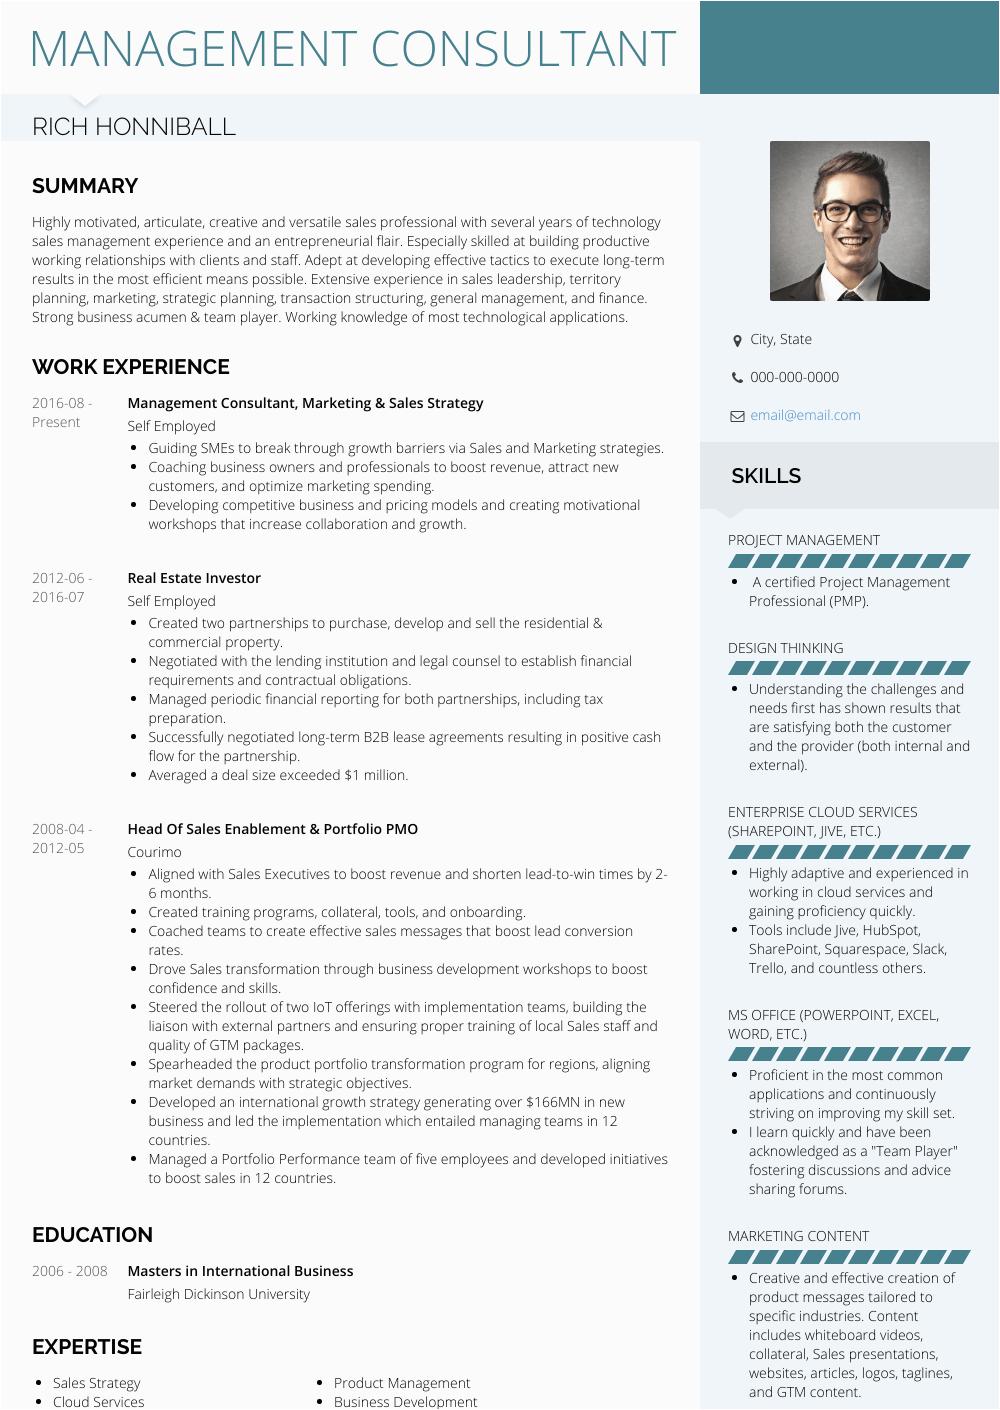 Sample Resume for Self Employed Business Owner Business Owner Self Employed Resume Examples Best Resume